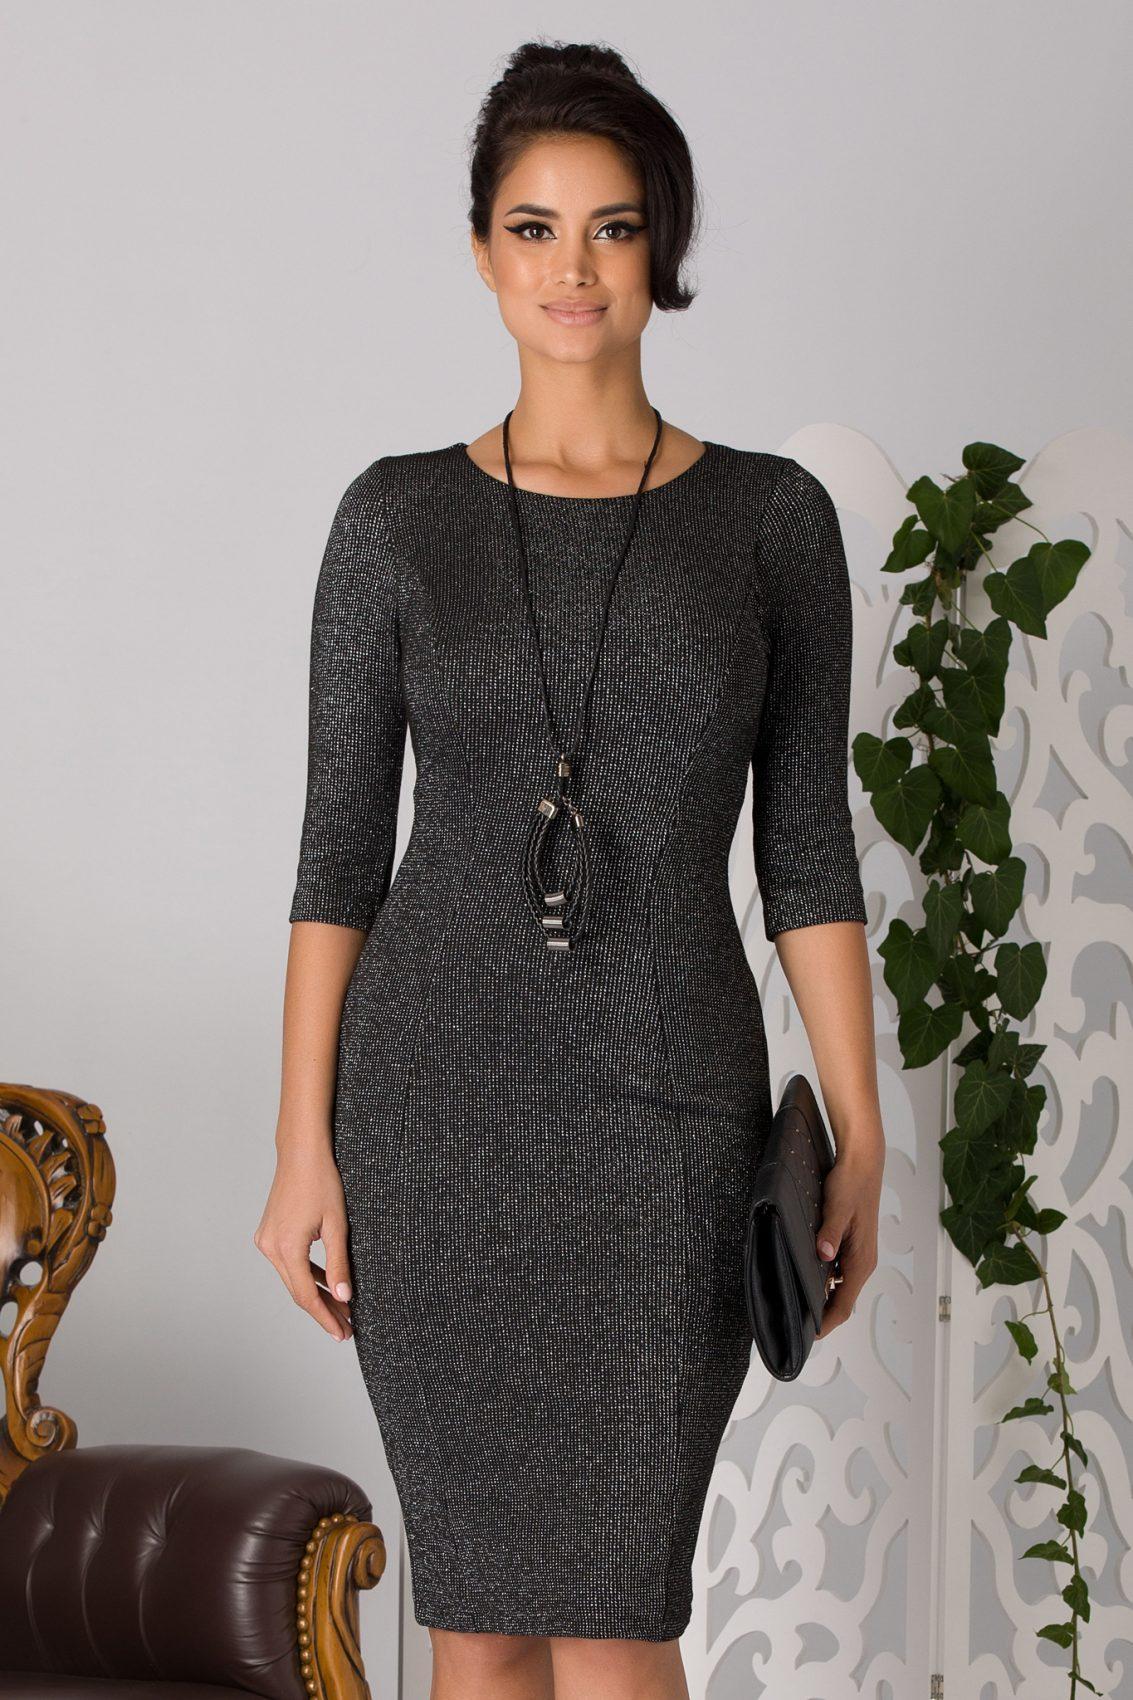 Sindy Black Dress